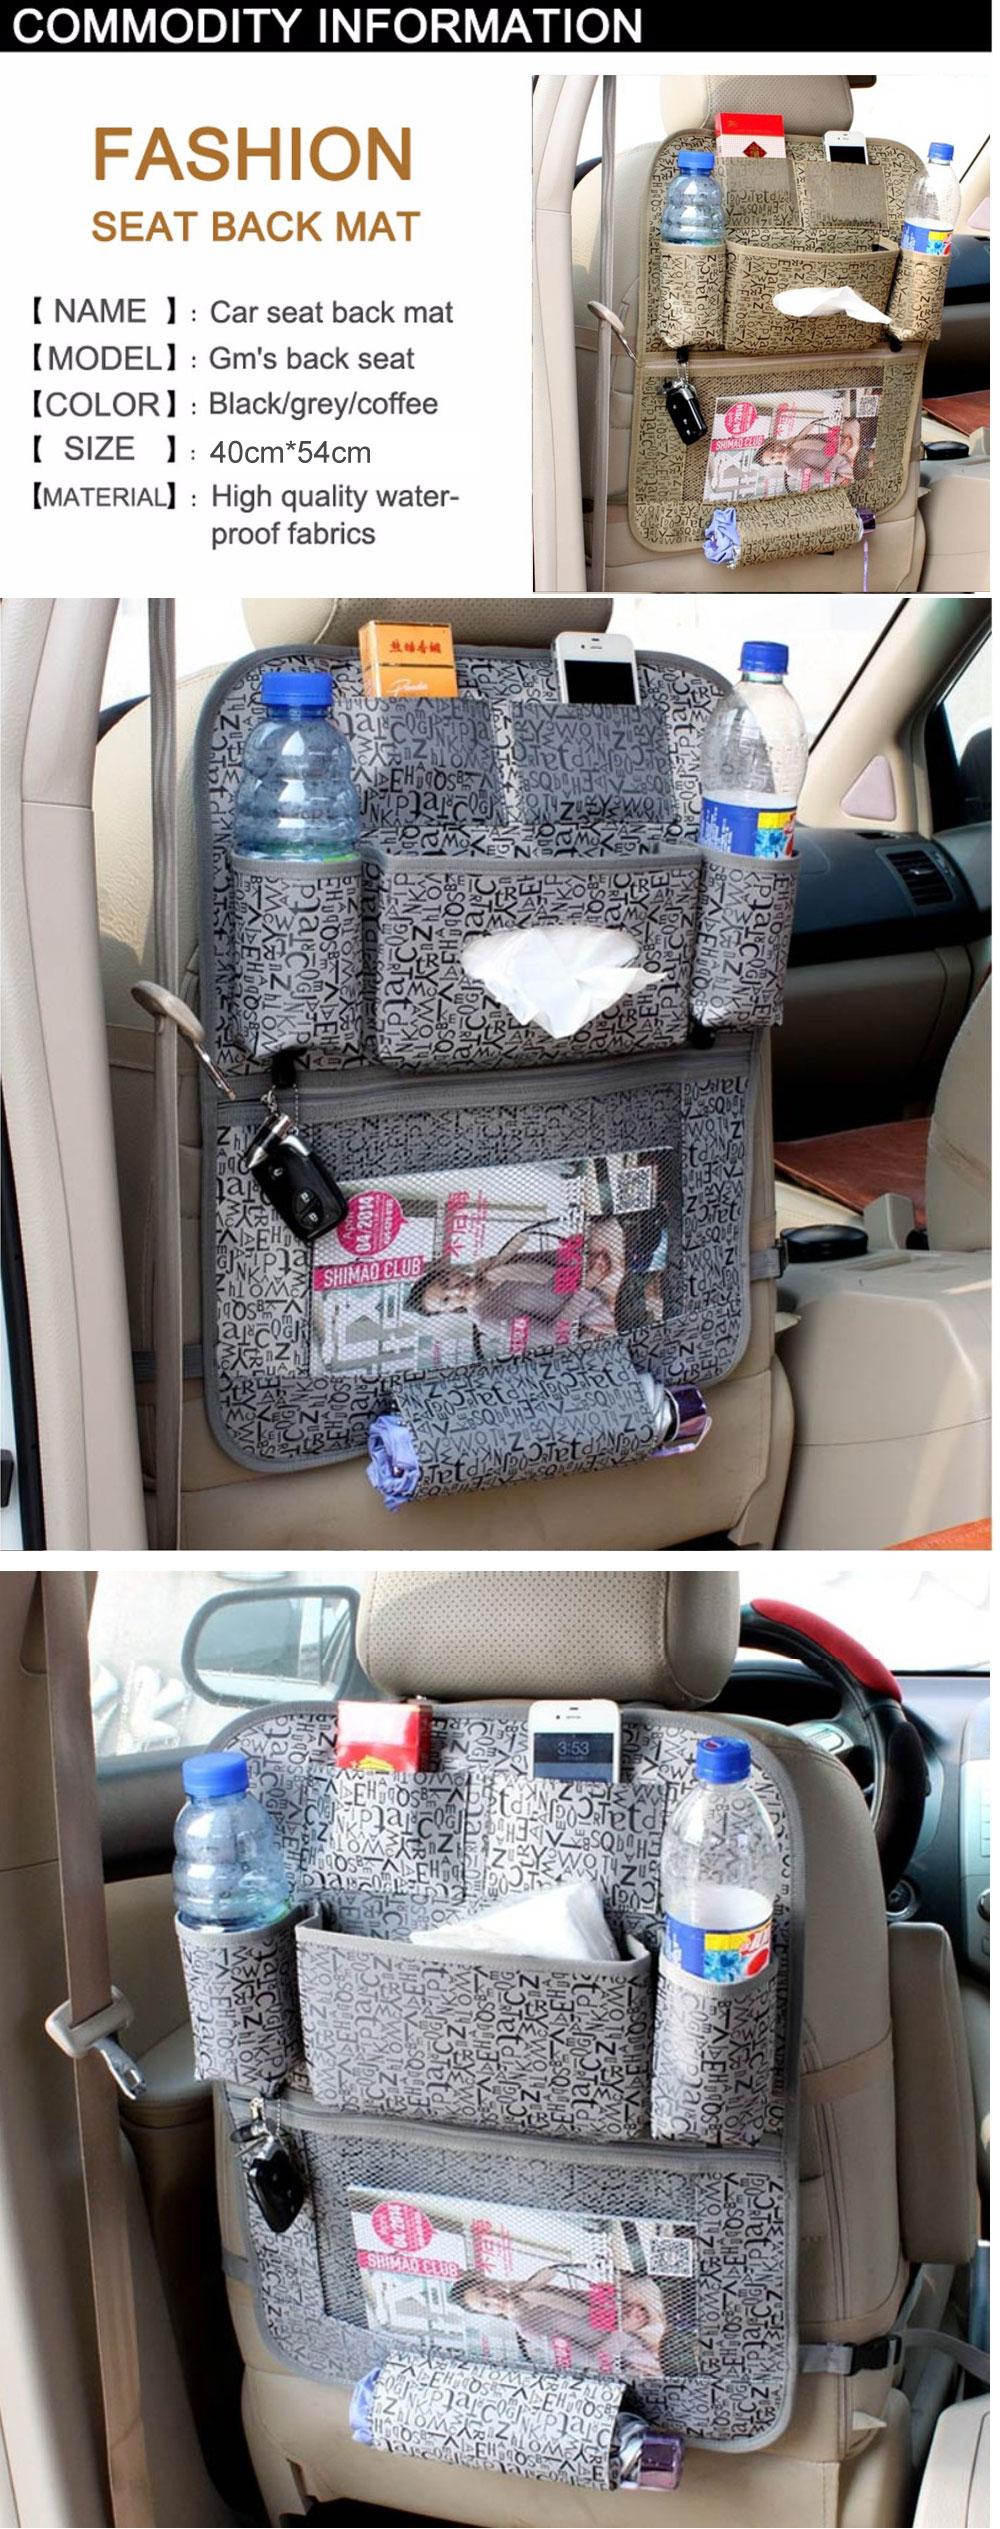 Car Organizer waterproof Car seat covers protector mat Car Storage Bags Seat Back Protector Case Cover Multi-Purpose 1